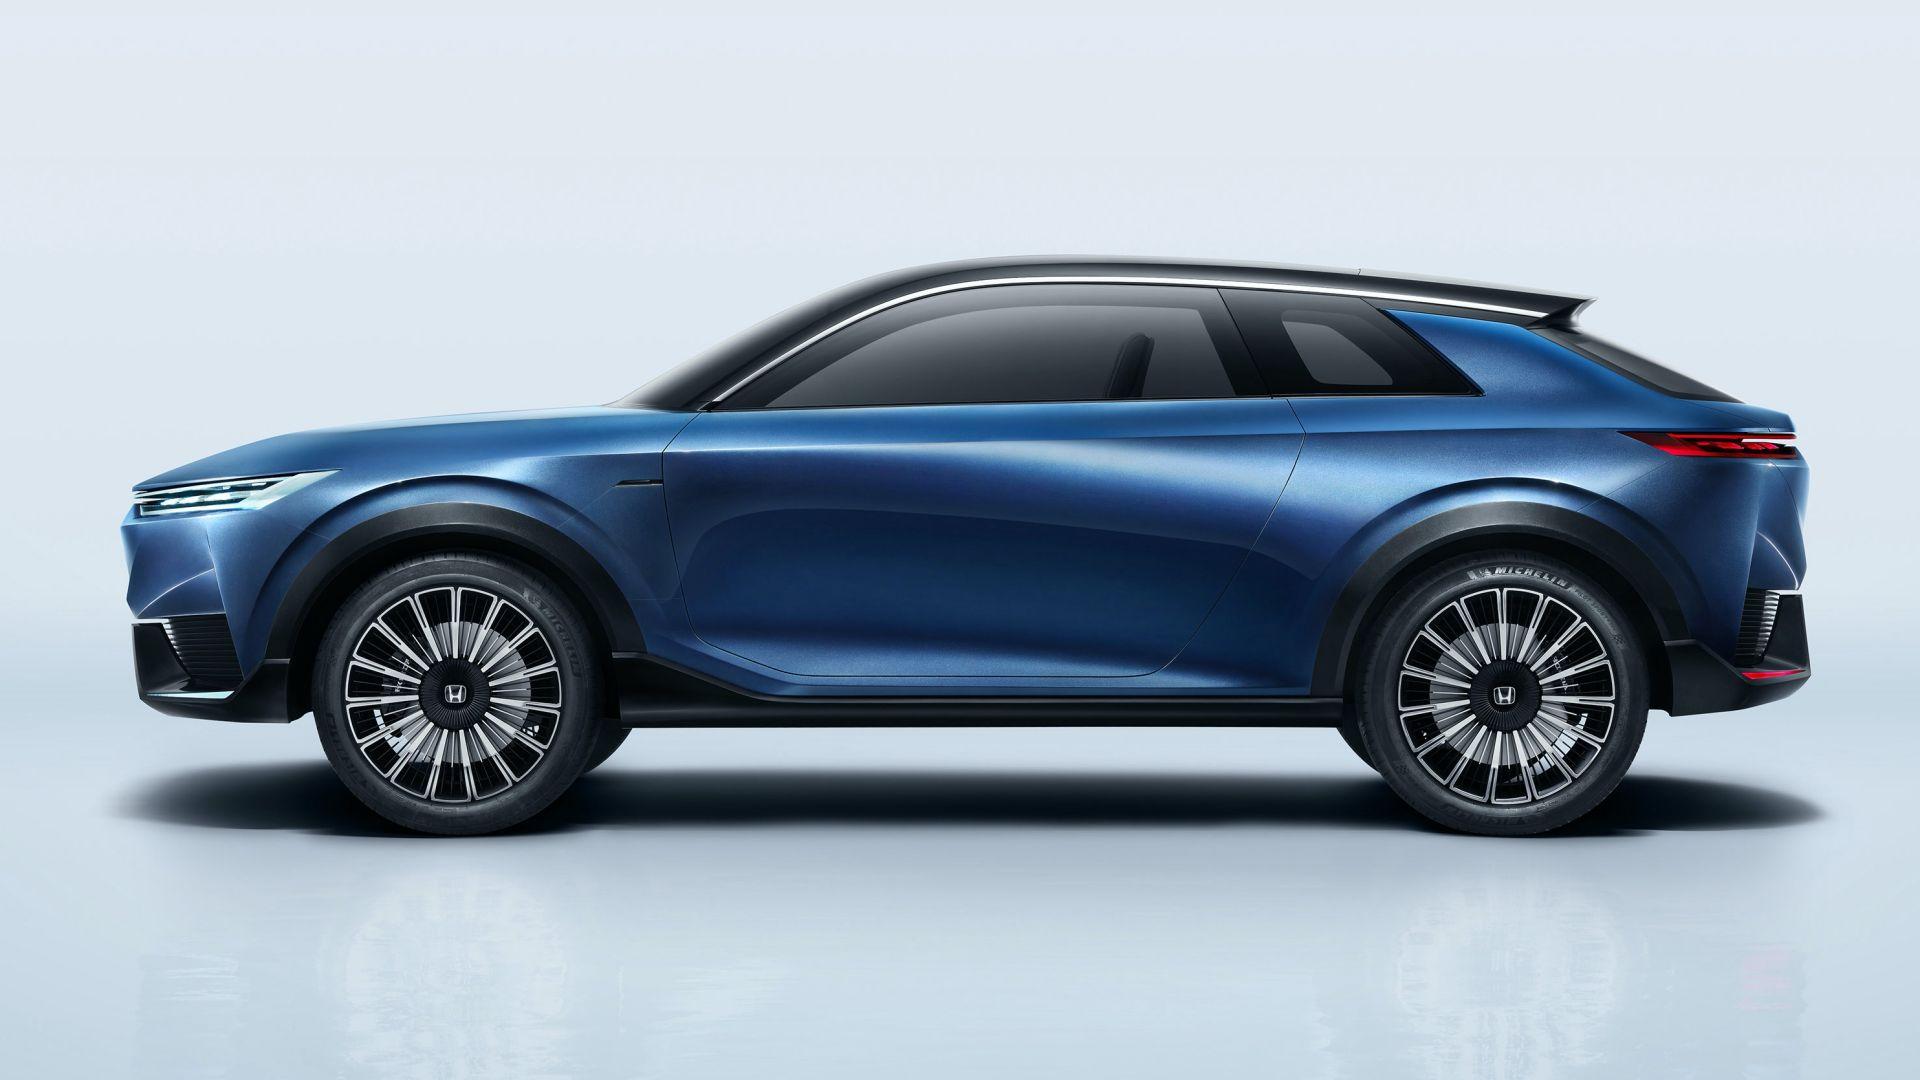 Honda SUV eConcept (4)